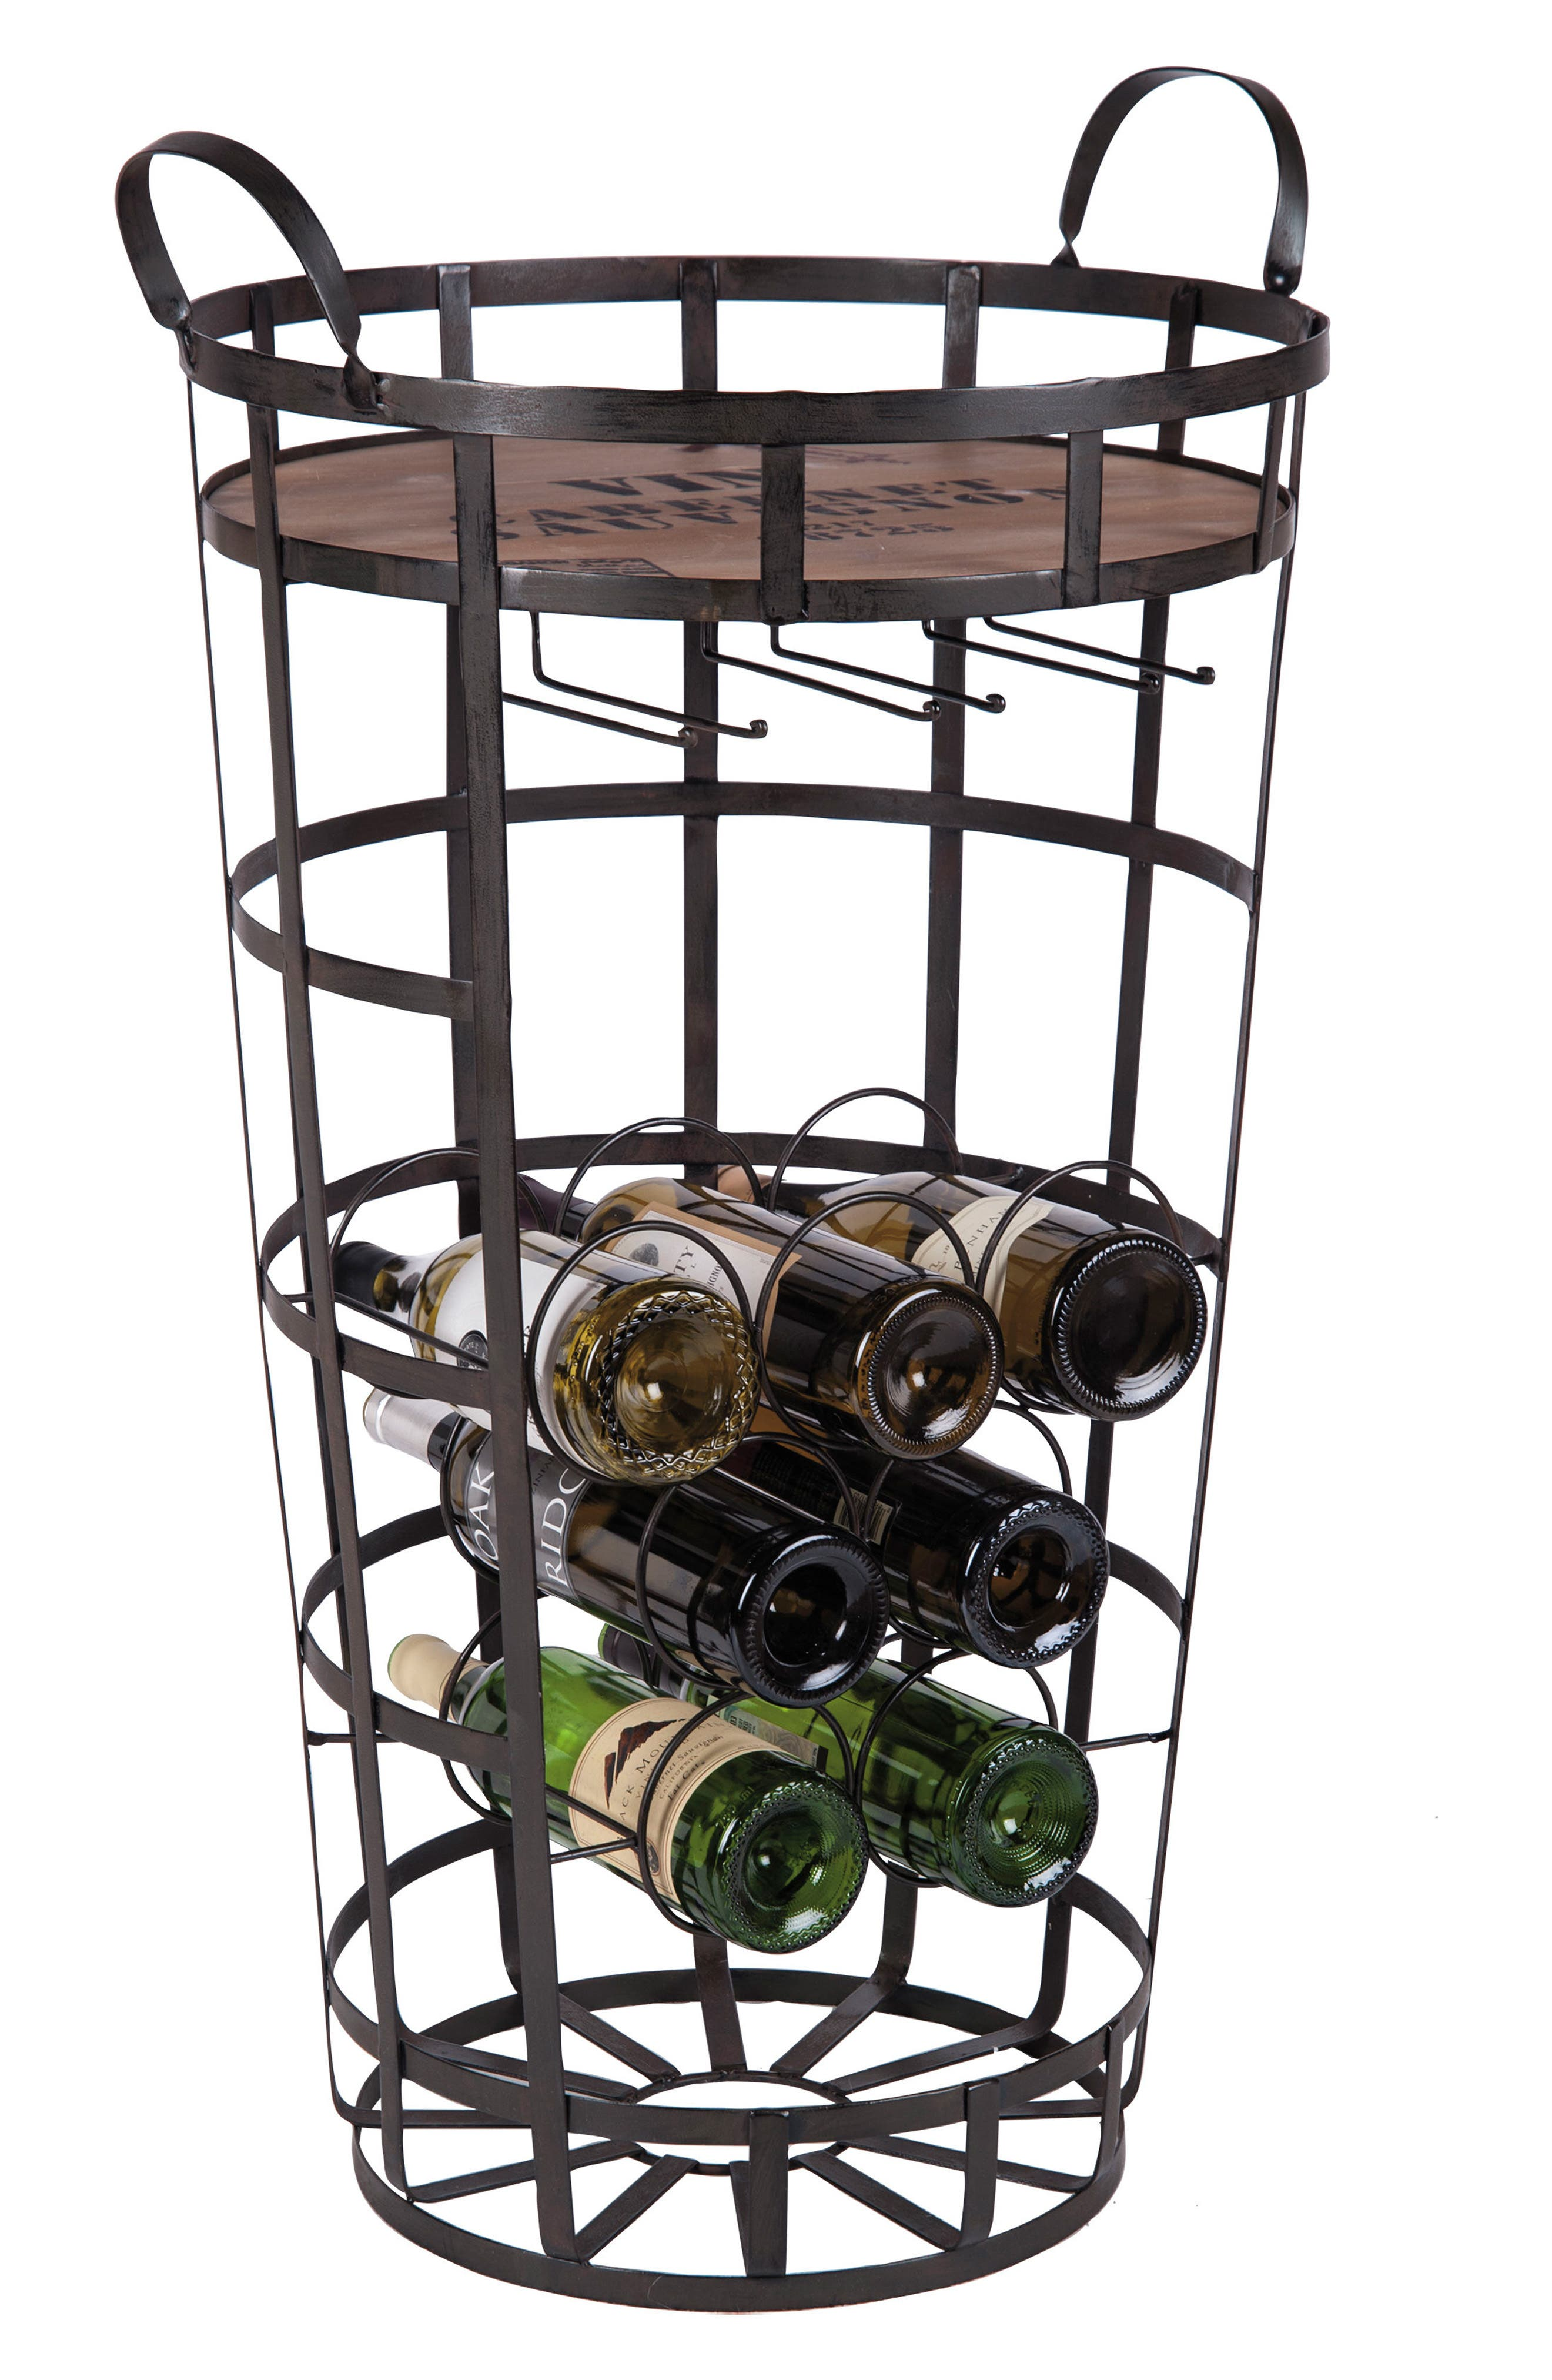 Alternate Image 1 Selected - Foreside Bar Cart & Wine Rack